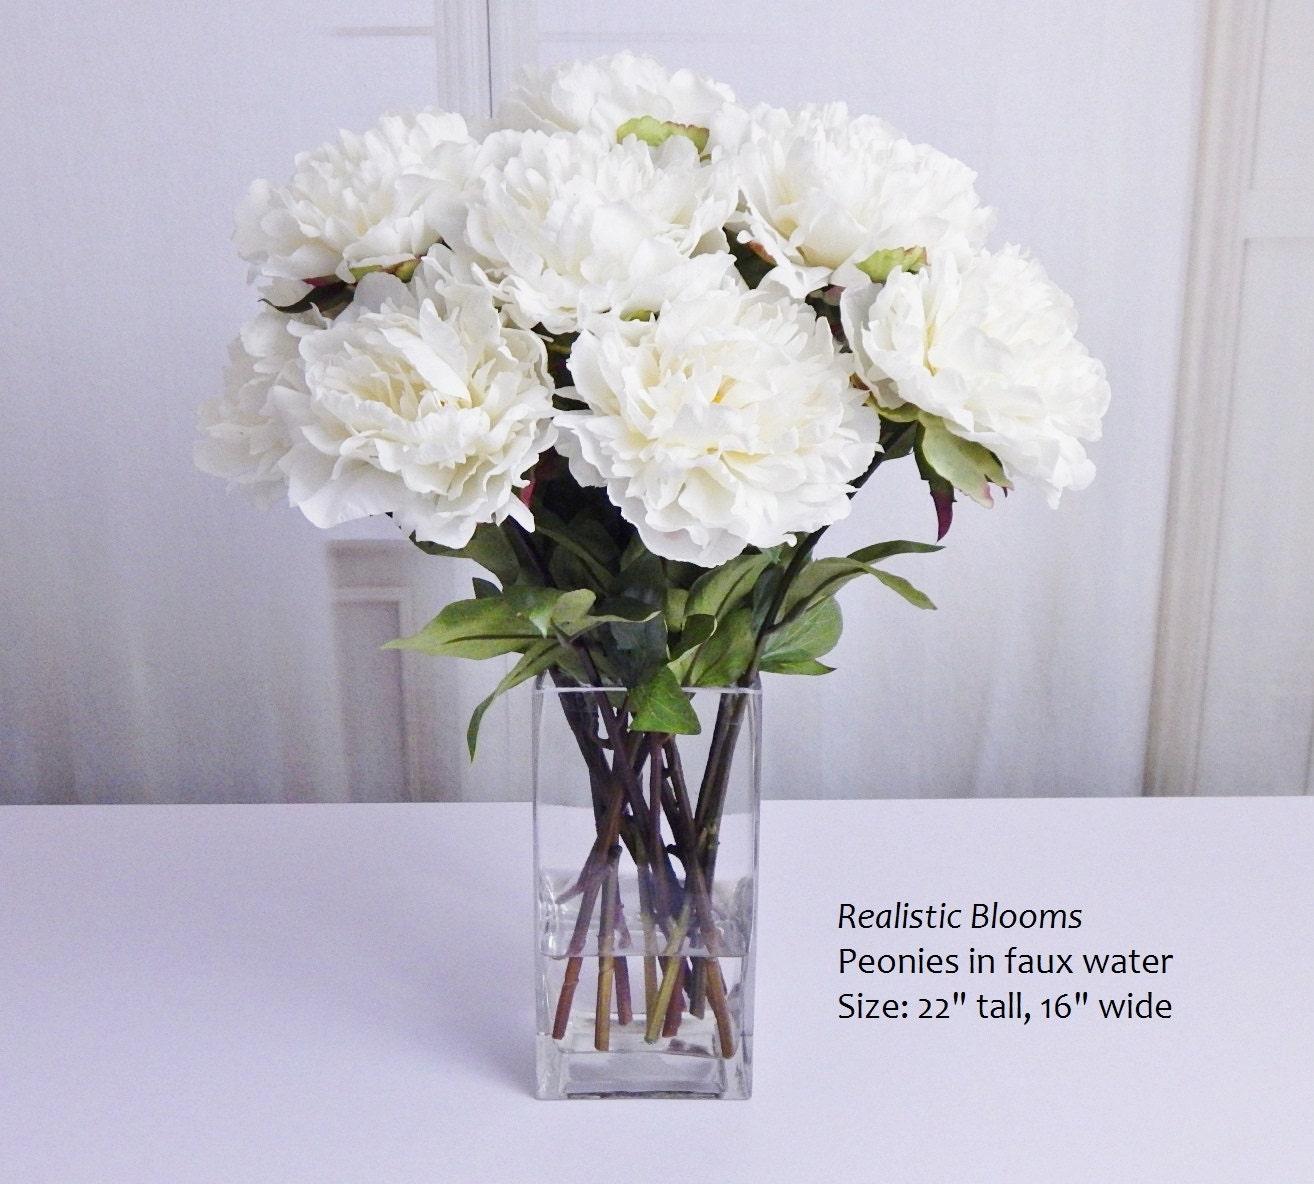 White cream pink silk peonypeonies glass vase faux water white cream pink silk peonypeonies glass vase faux water acrylicillusion real touch flowers tall floral arrangement centerpiece reviewsmspy